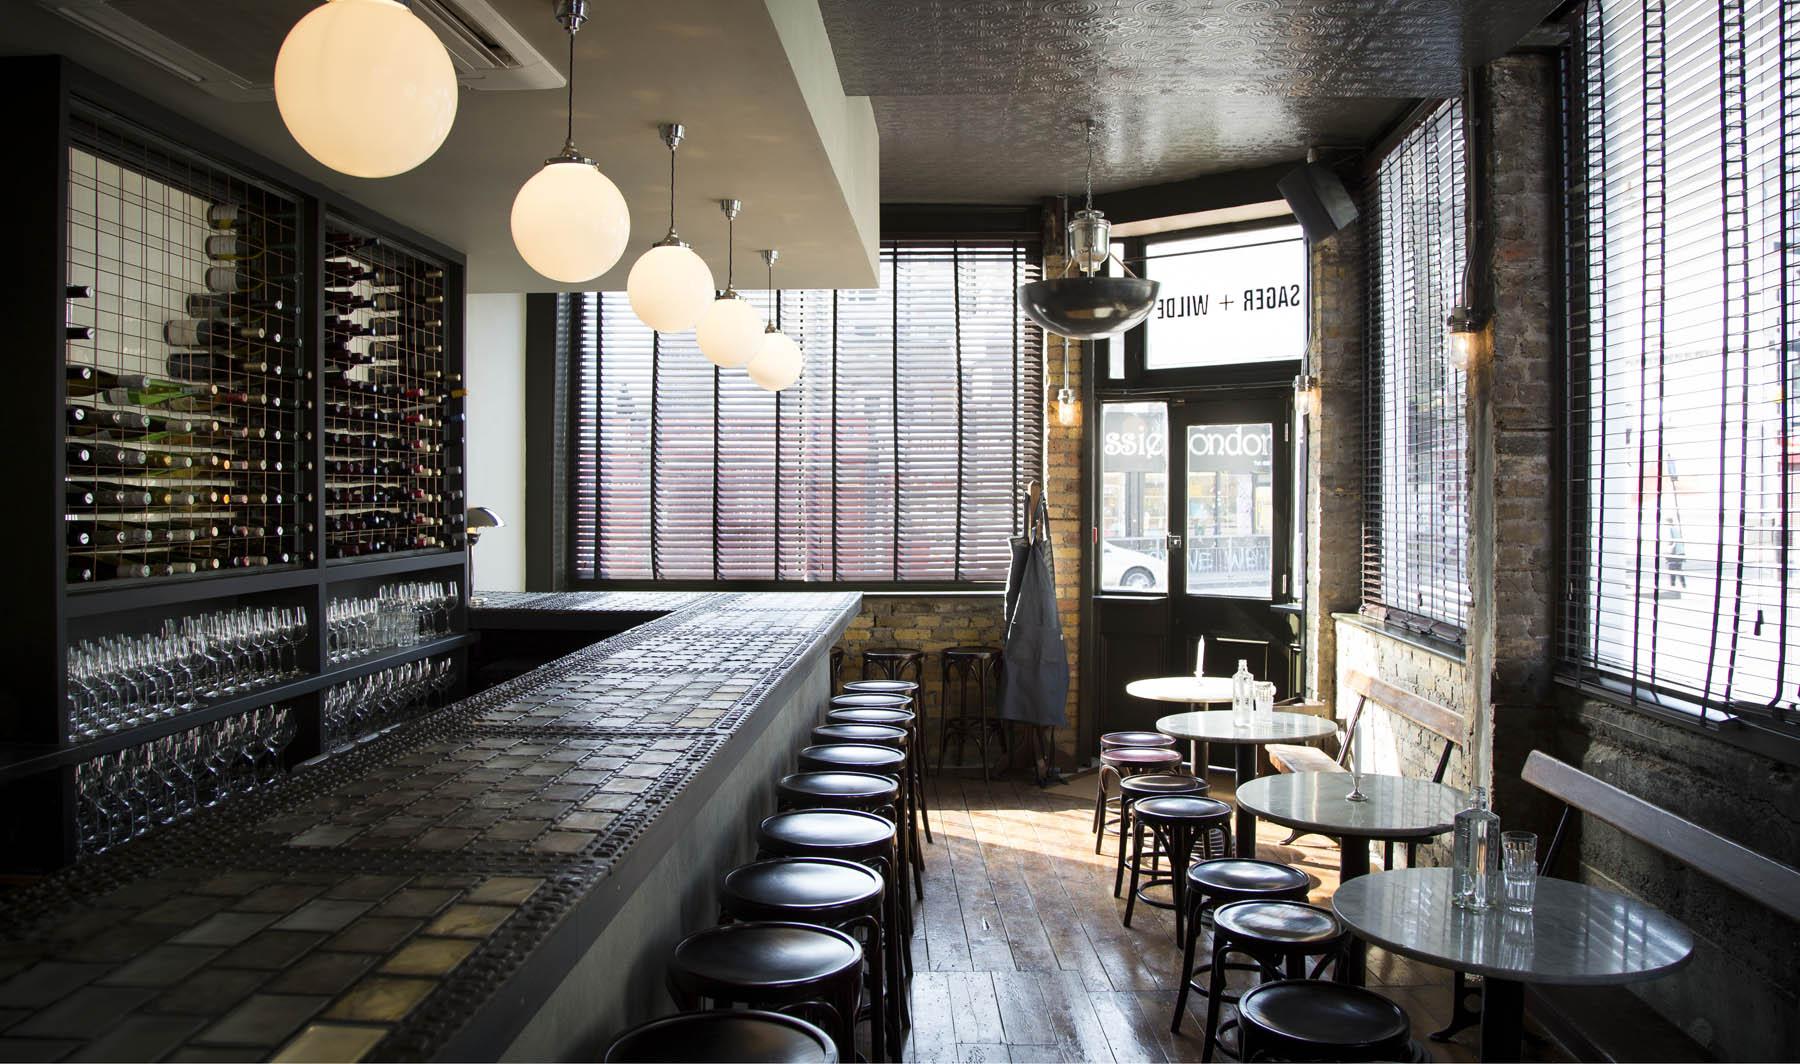 Sager + Wilde East London bar